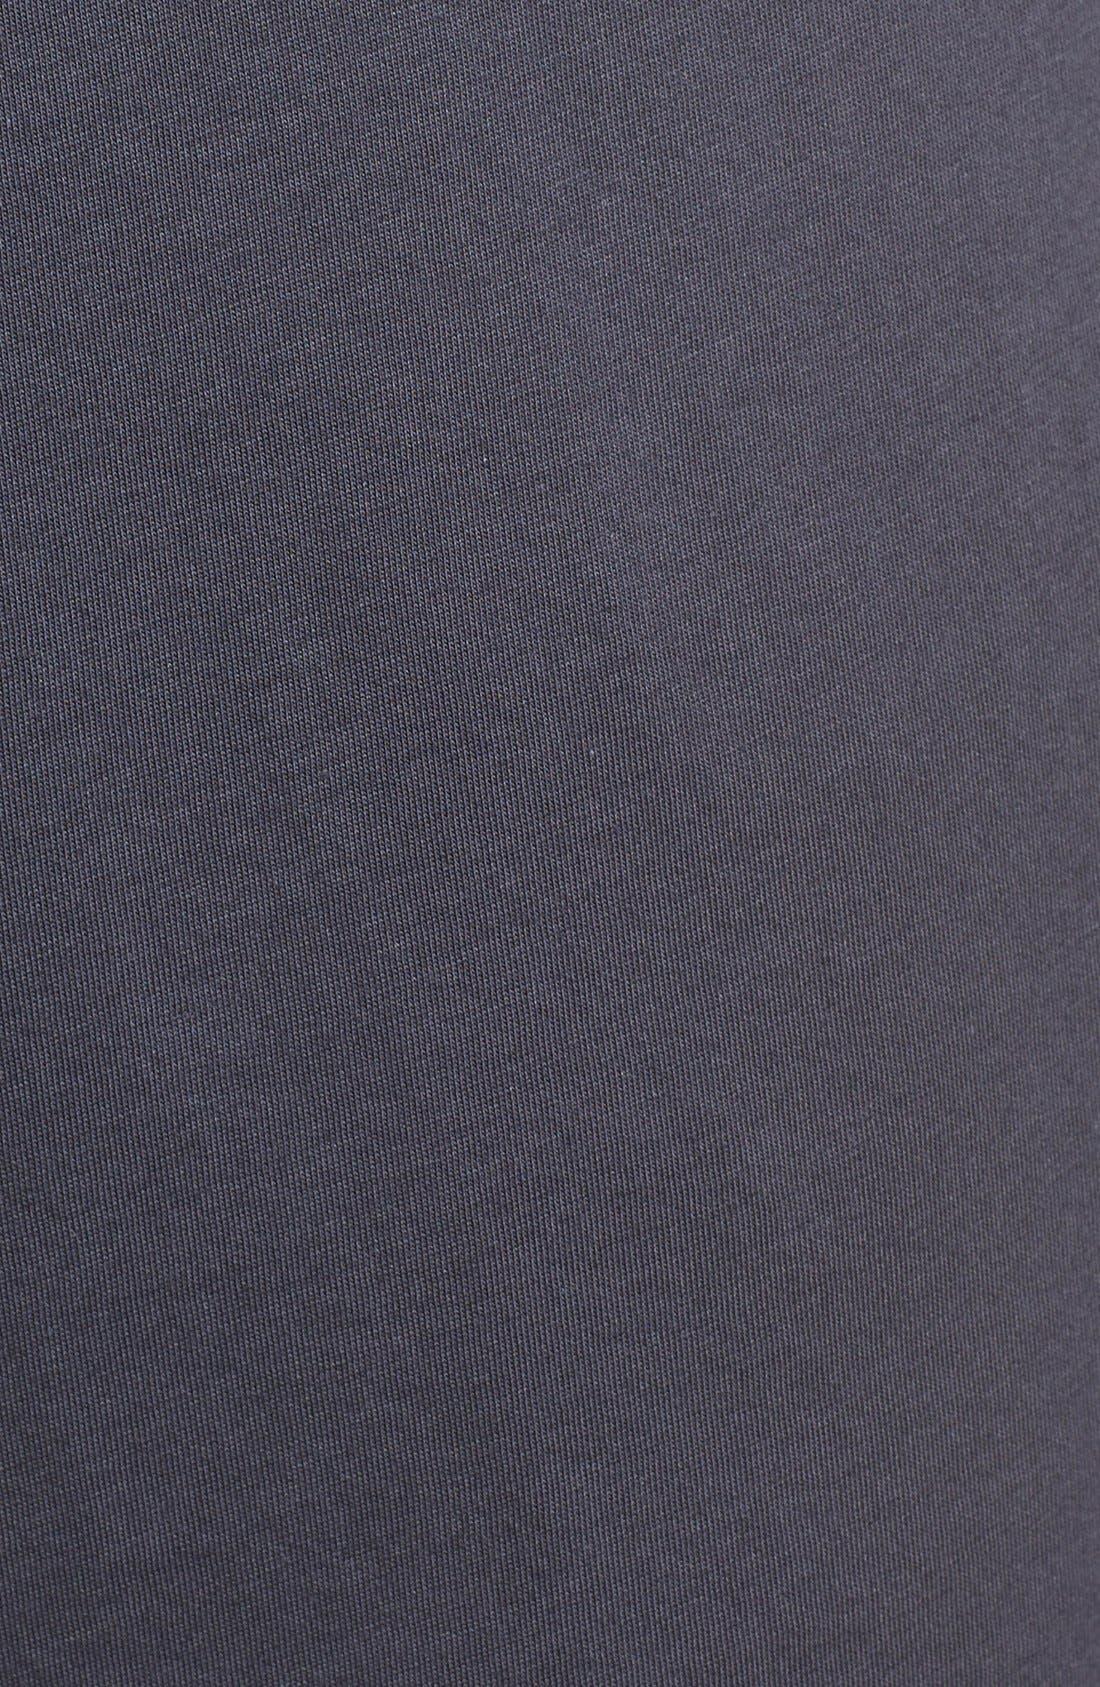 Peruvian Pima Cotton Lounge Shorts,                             Alternate thumbnail 8, color,